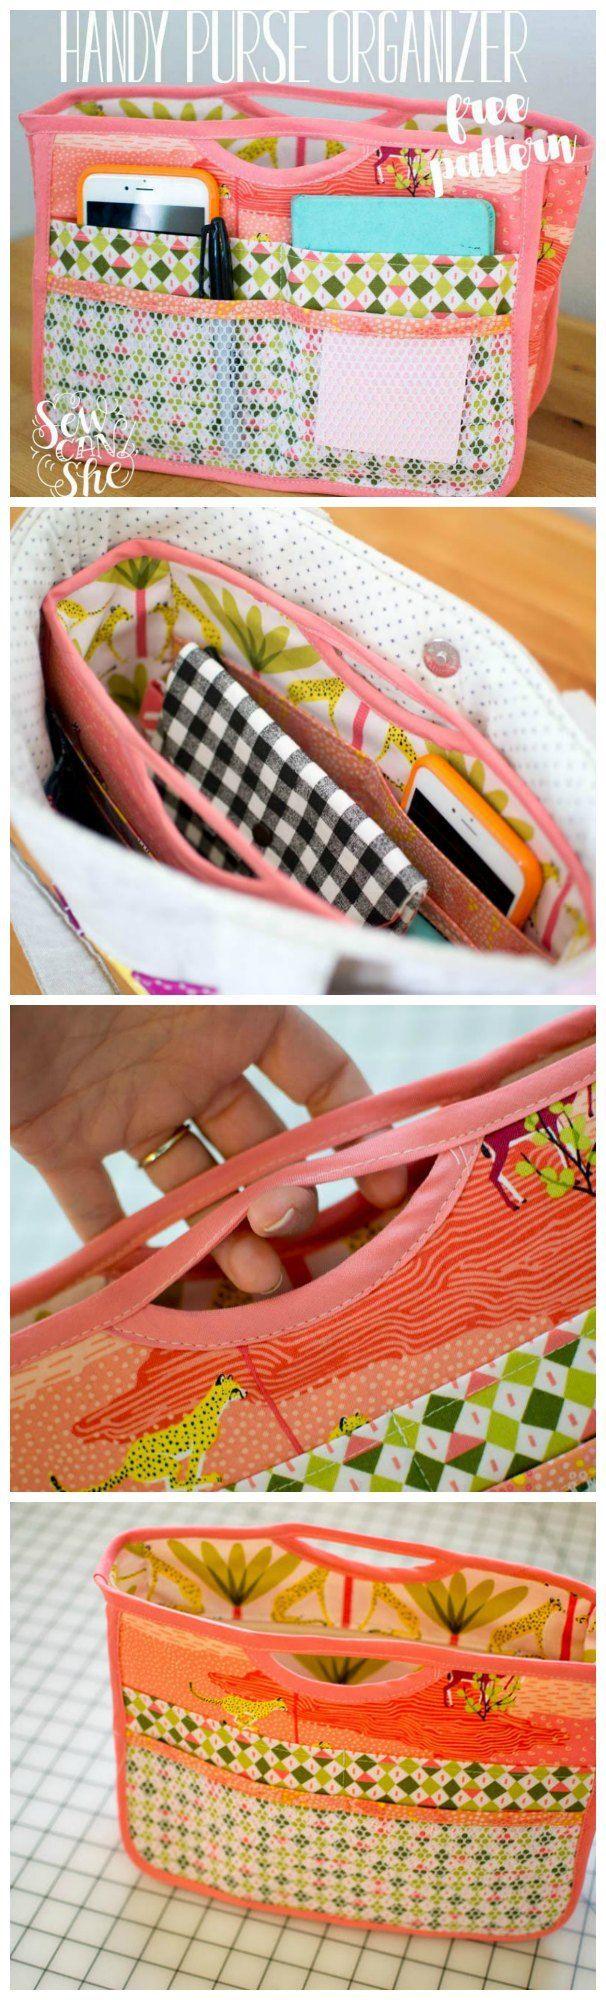 Handy Purse Organizer FREE sewing pattern